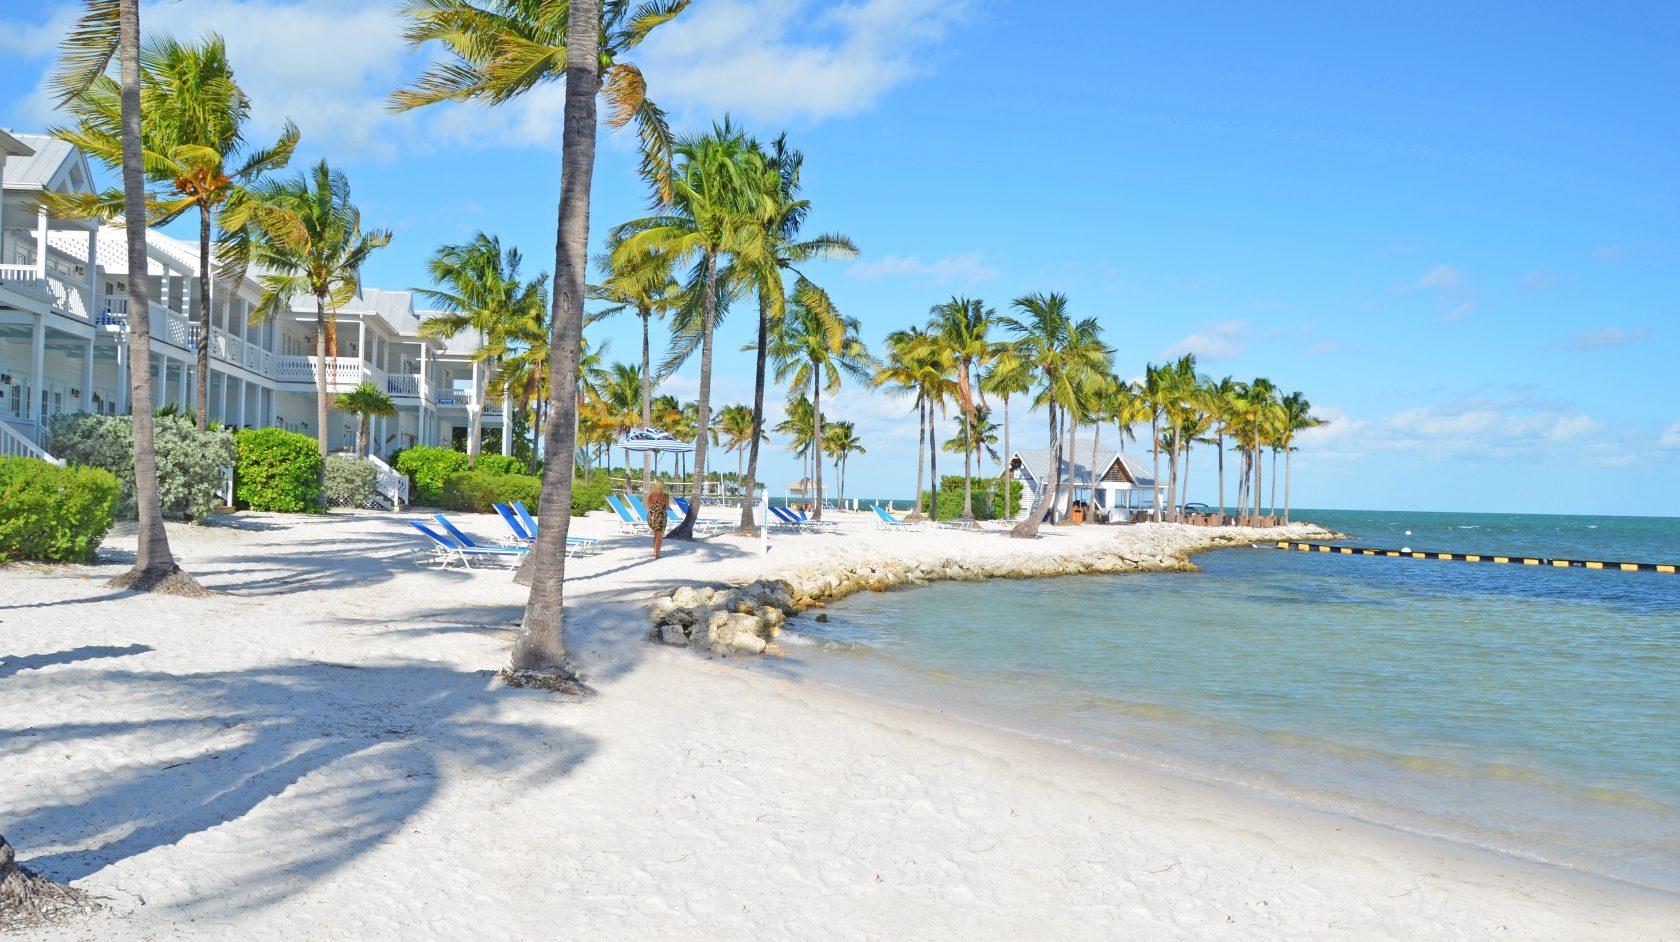 Beachfront Florida Keys Resort | Tranquility Bay Beachfront Resort